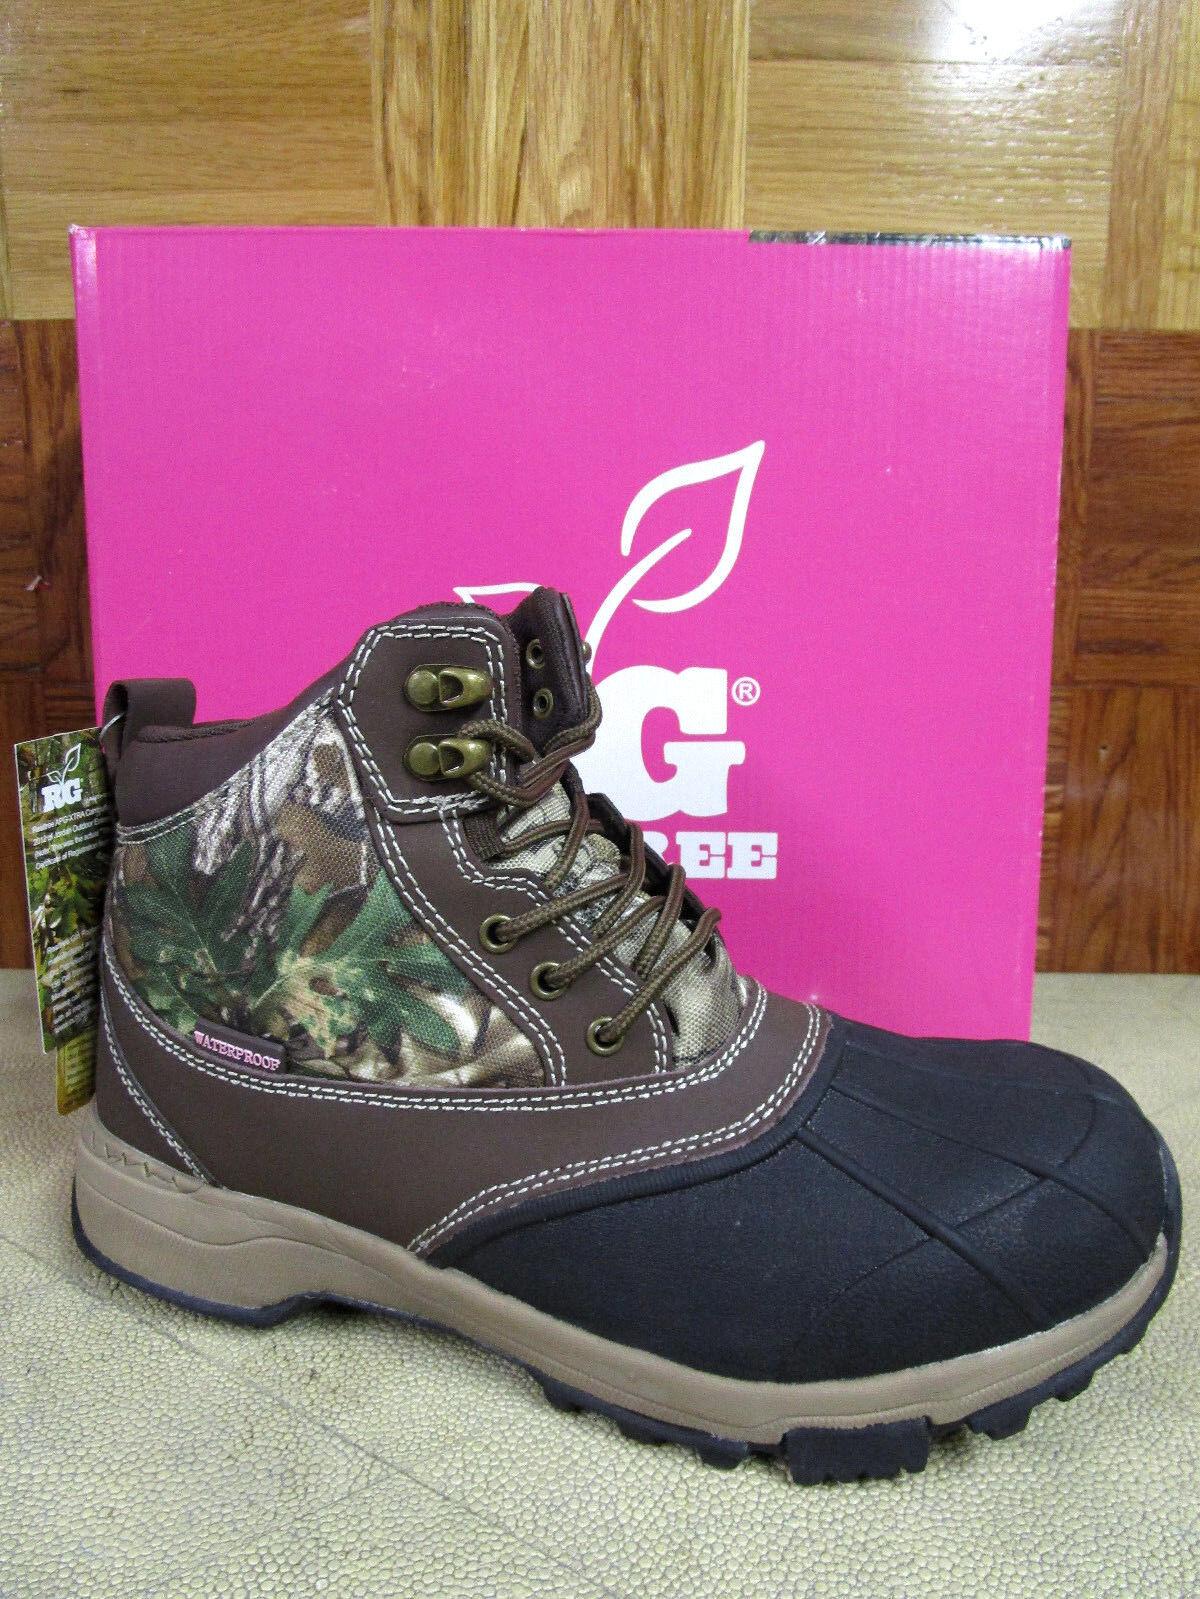 Realtree Girl (Ms.Denver) RW4121301 Waterproof Boots